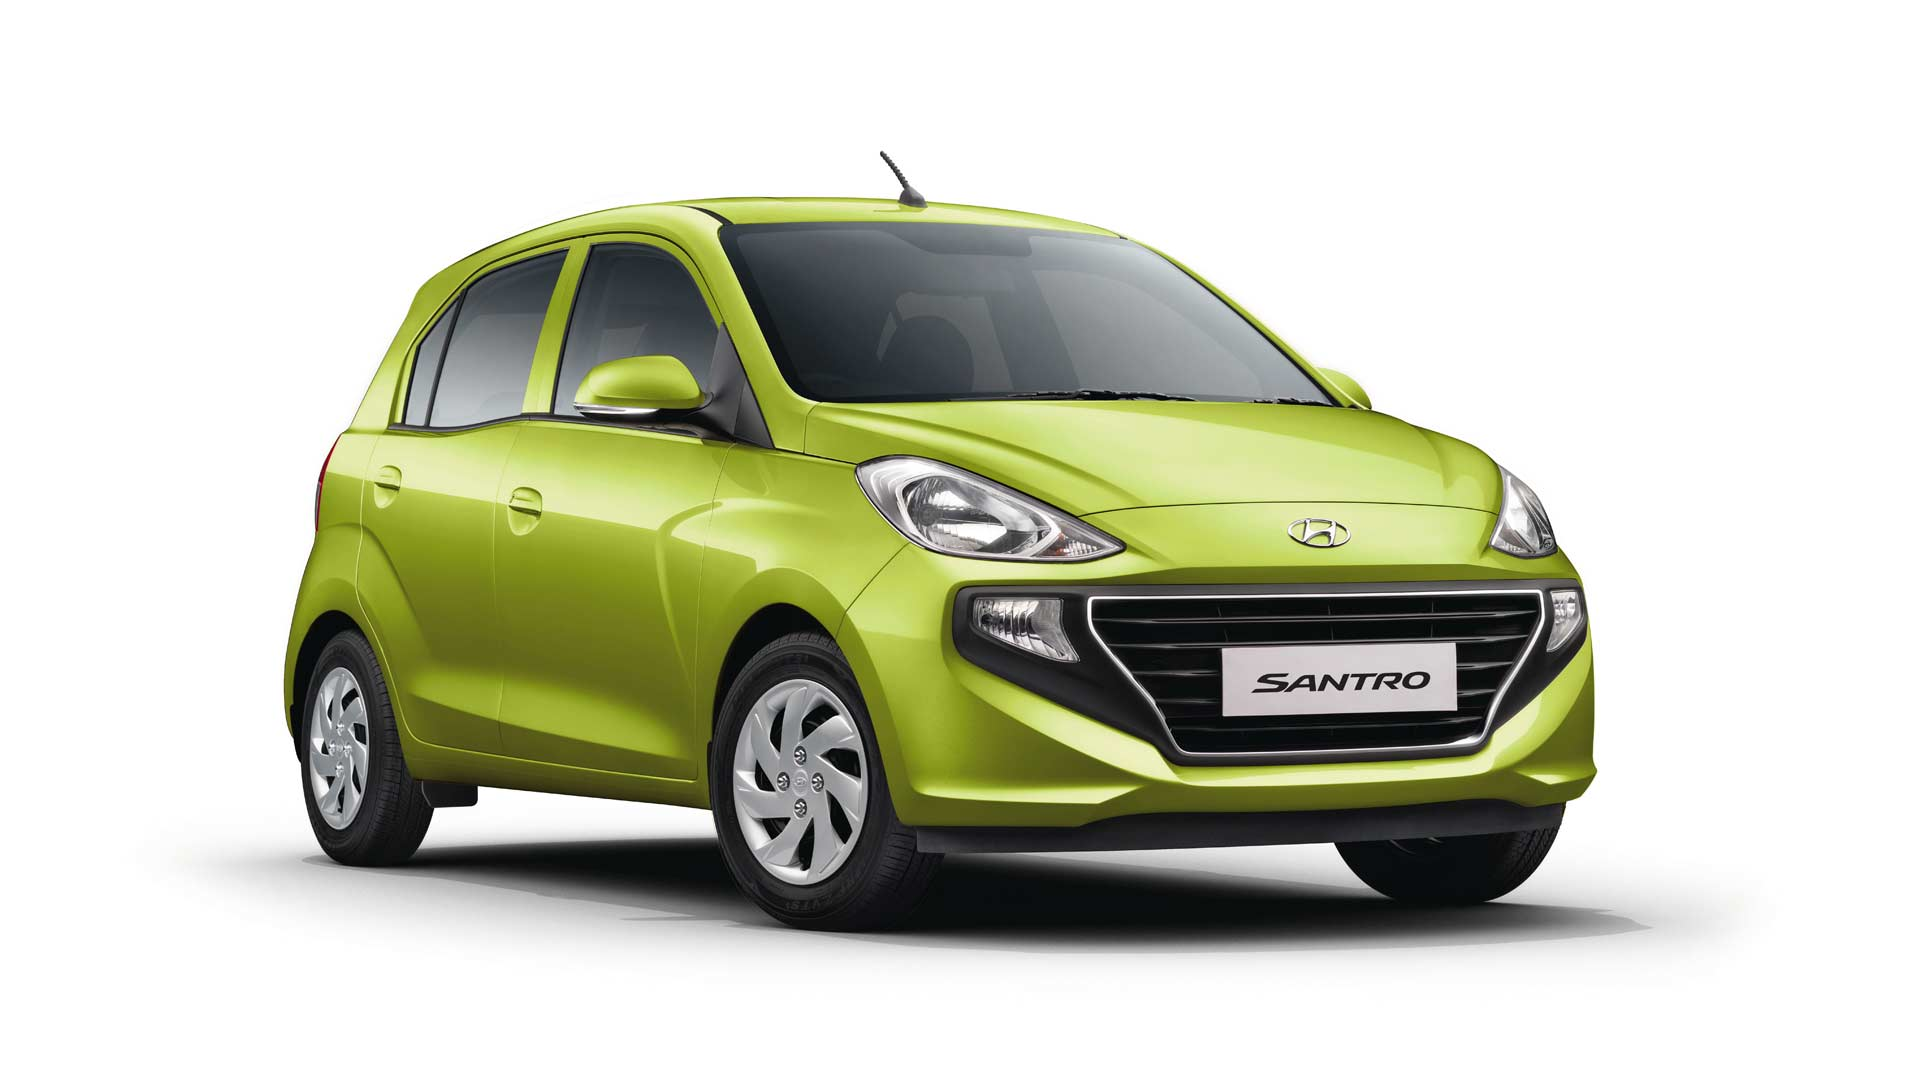 2019-2nd-generation-Hyundai-Santro_2